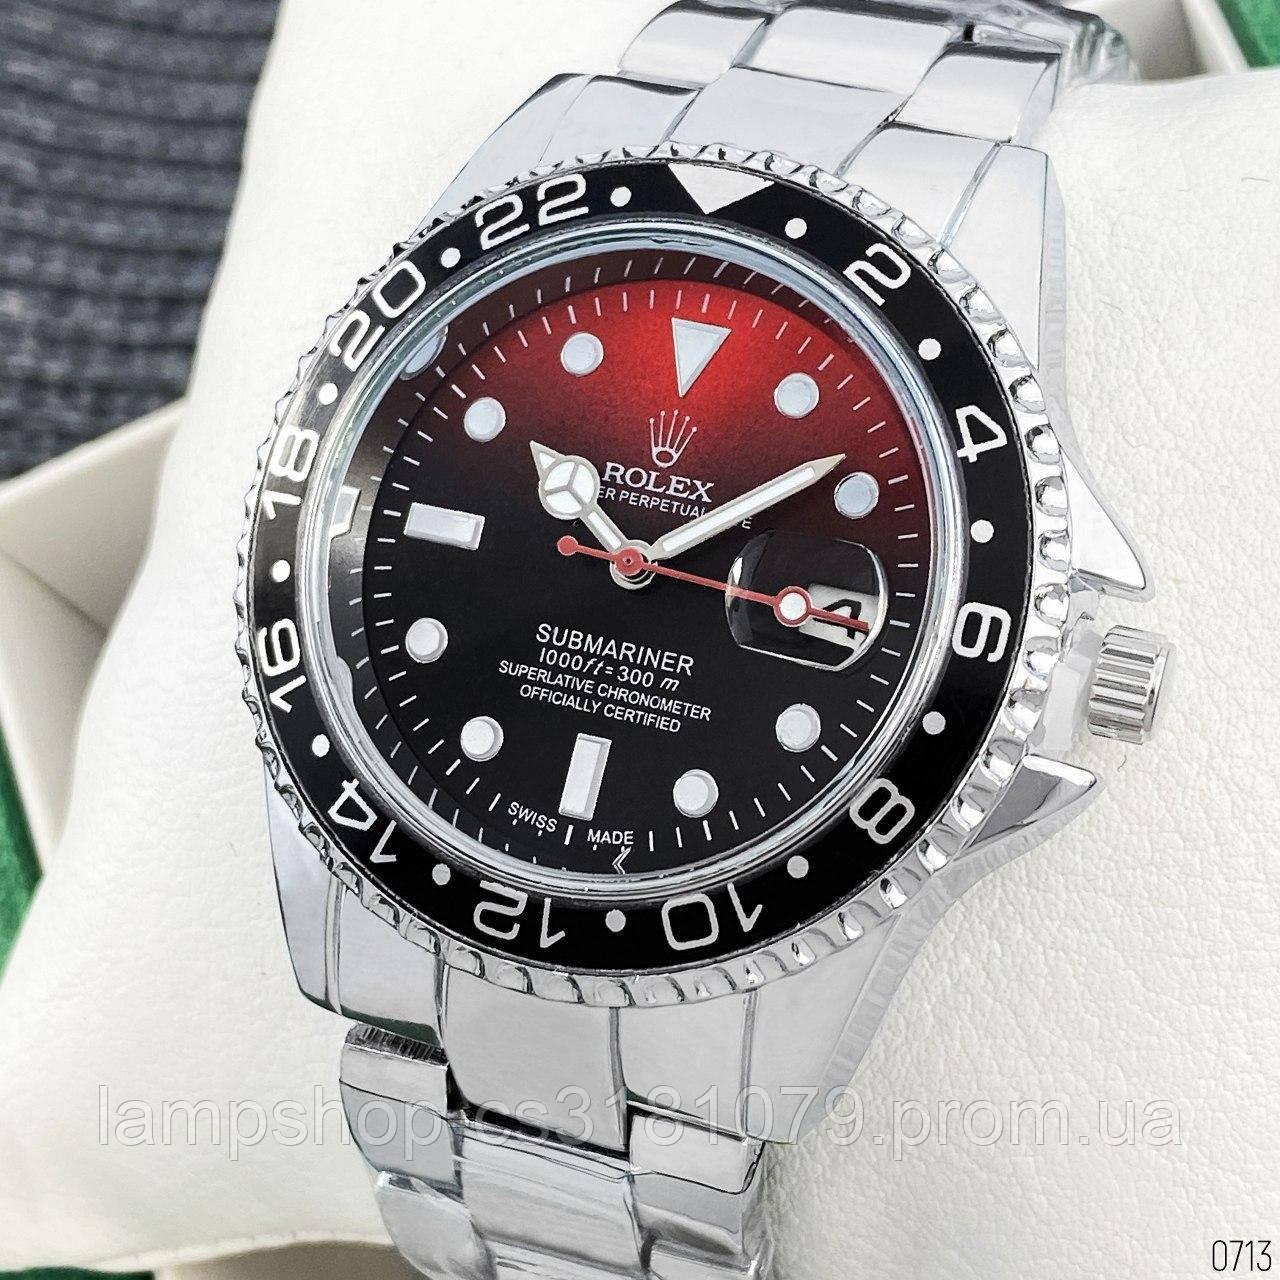 Rolex Submariner 6478 Silver-Red-Black